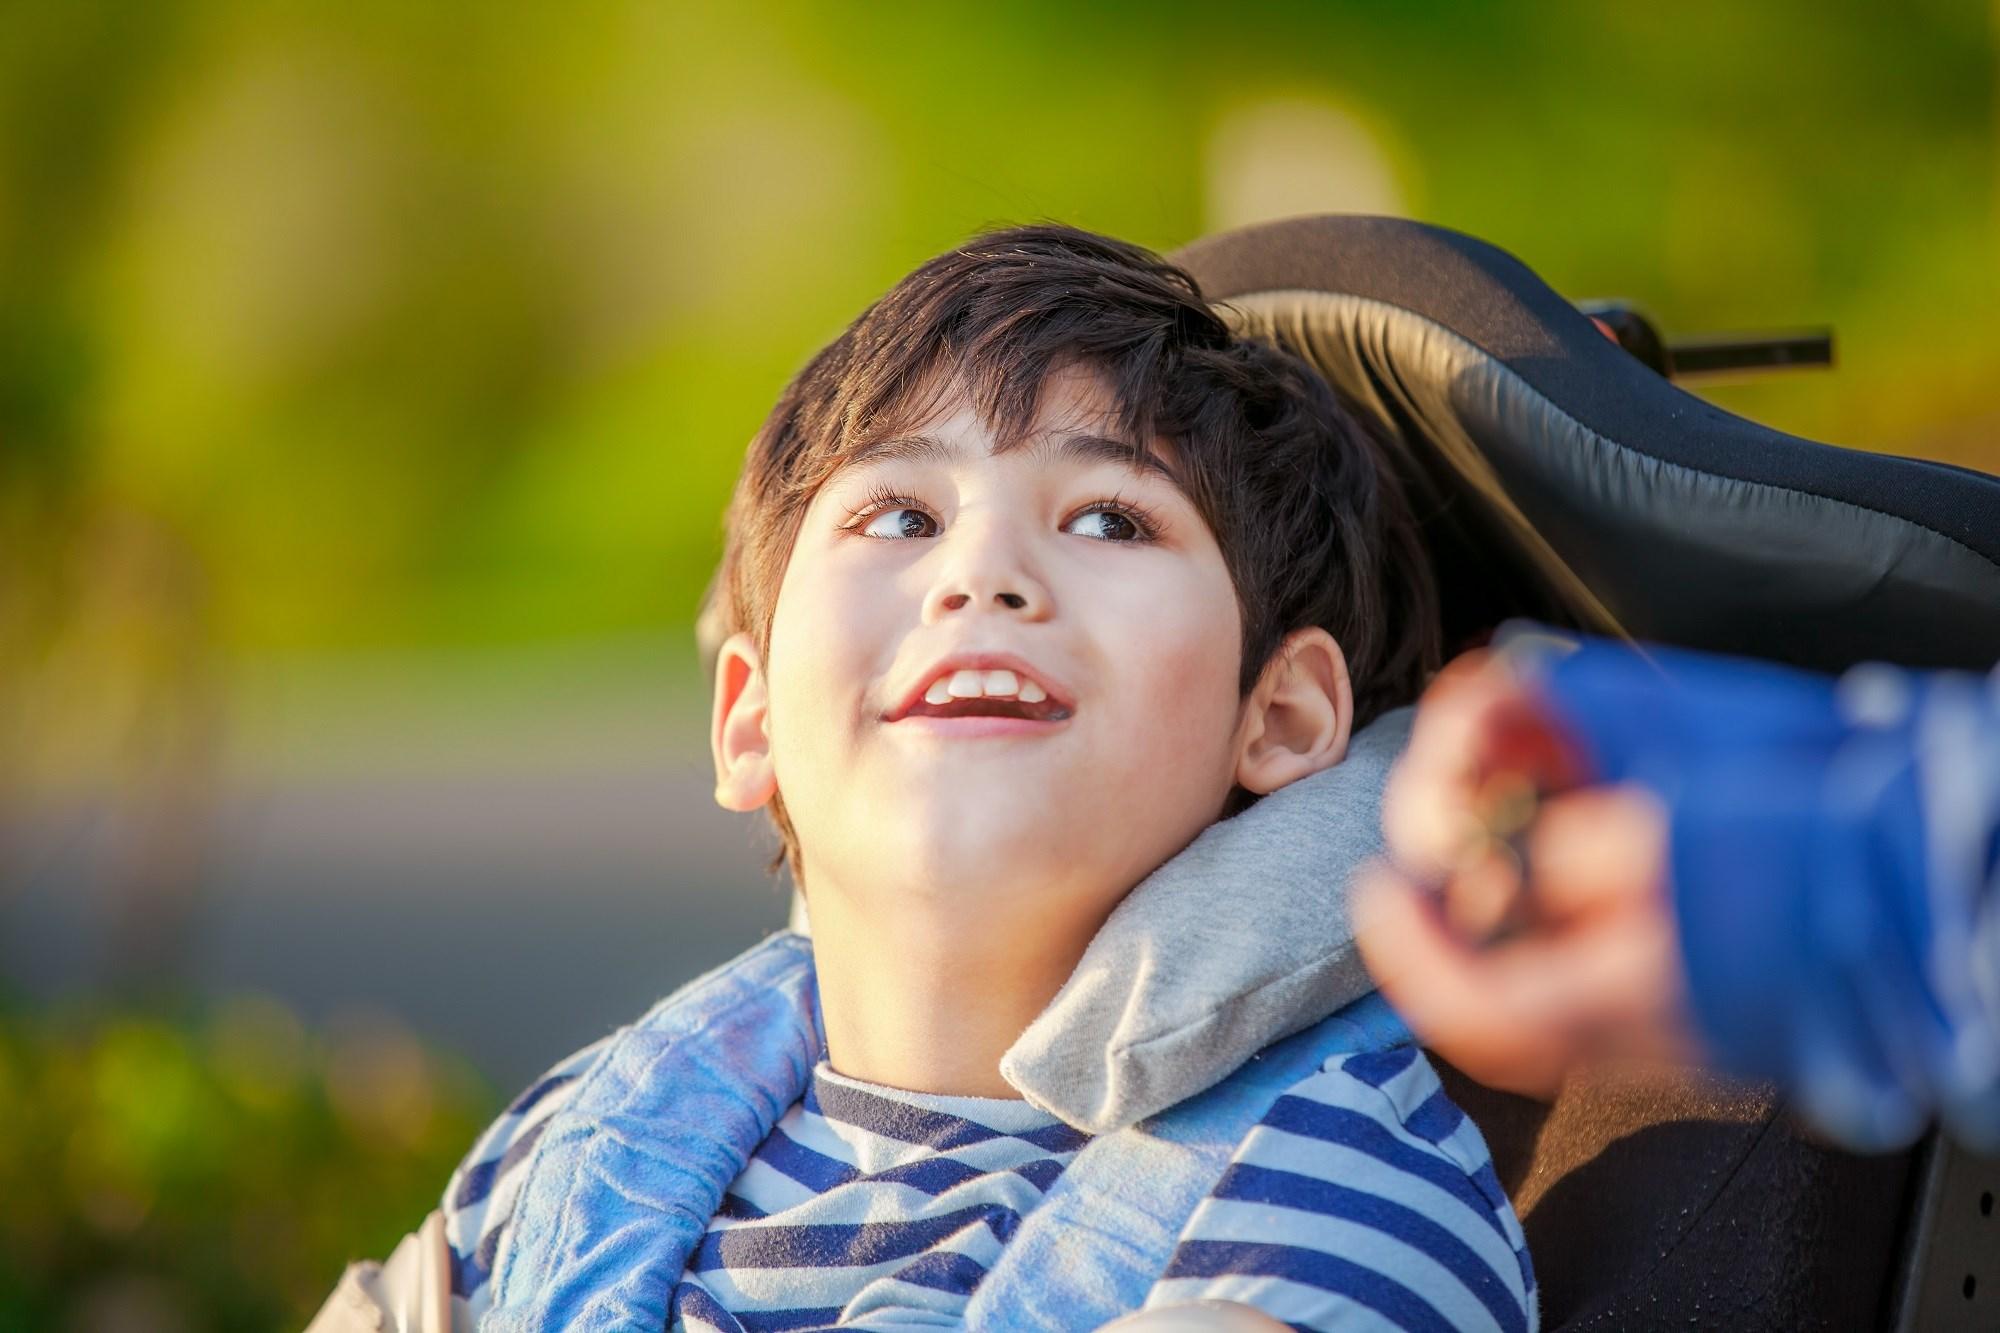 Risperidone Reduces Symptoms in Children With Choreoathetoid Cerebral Palsy